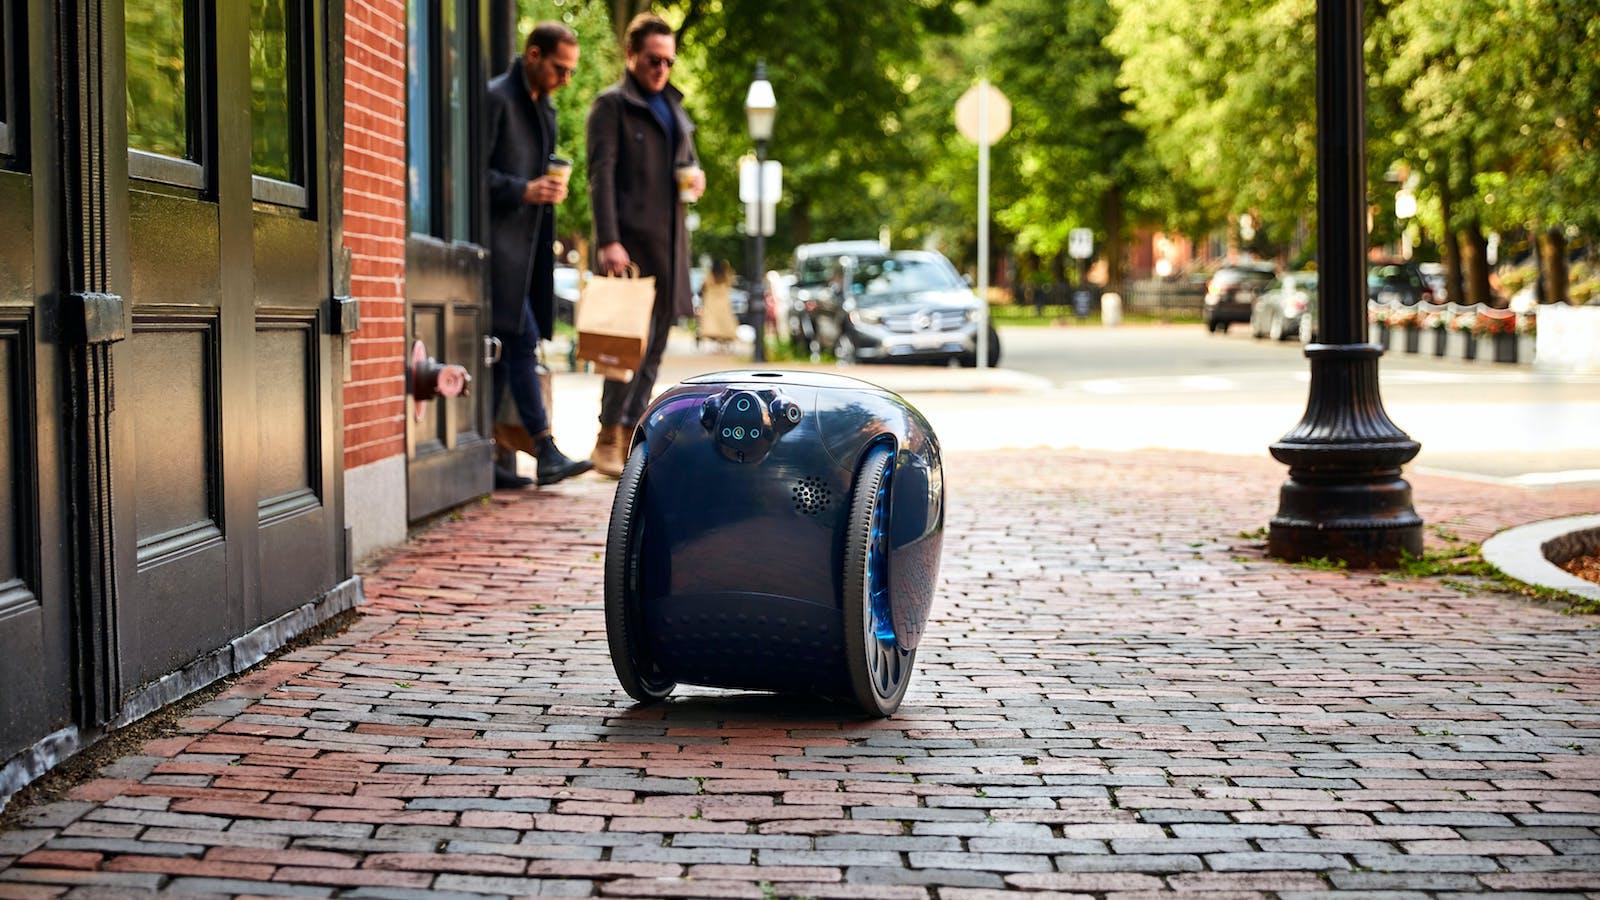 Gita Cargo-Carrying Robot